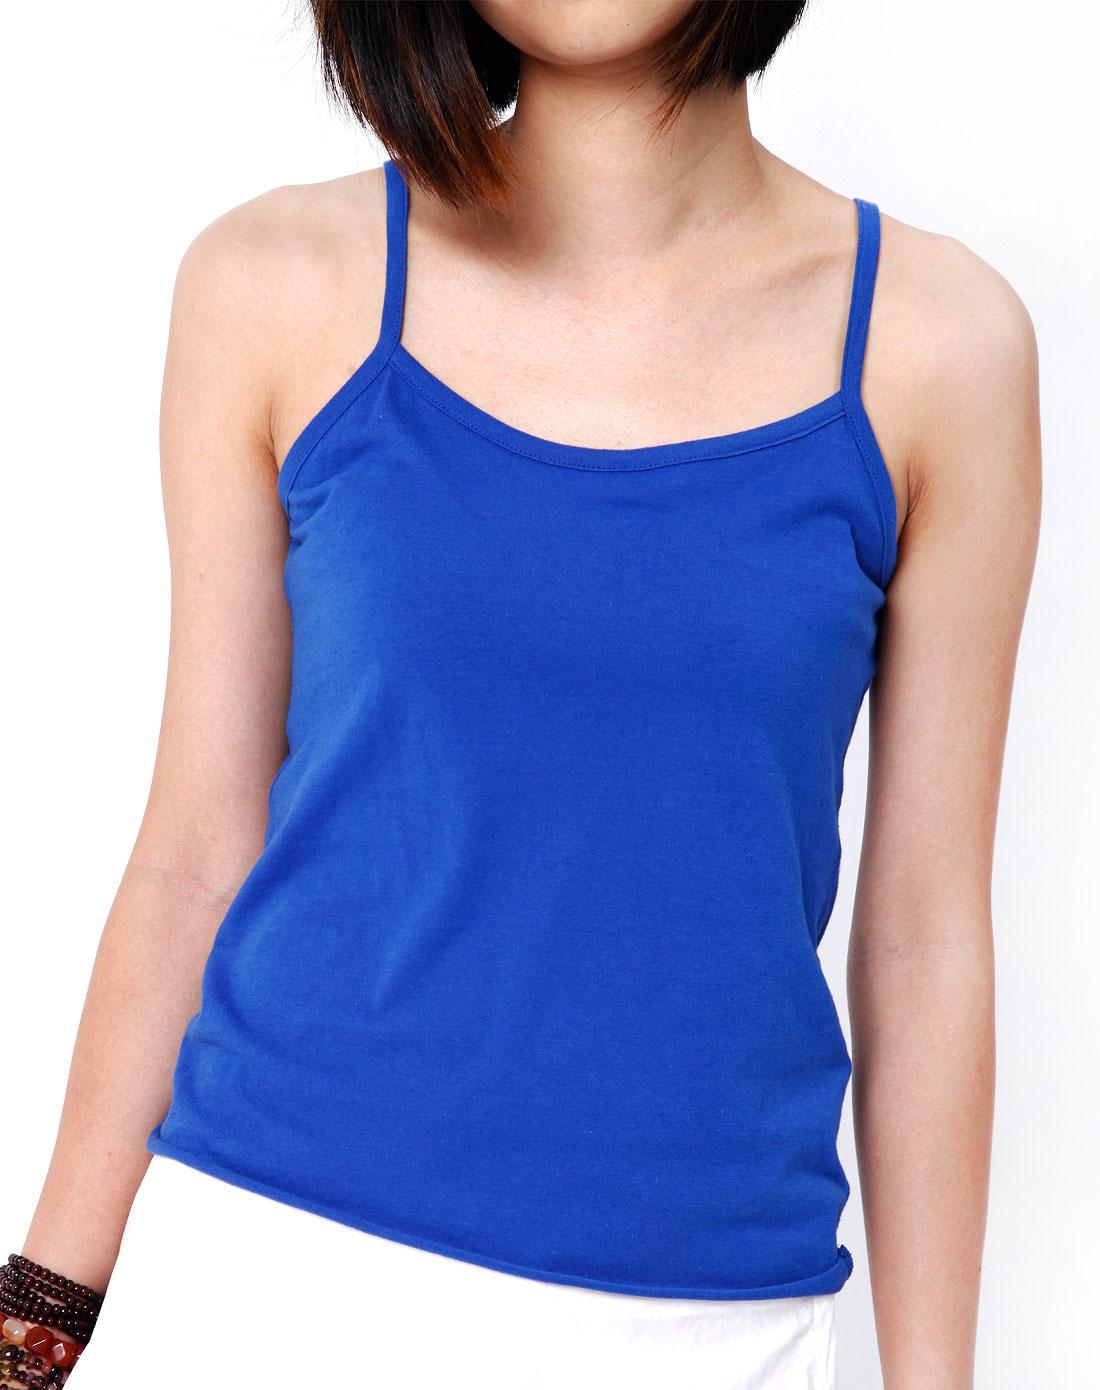 lala深蓝色时尚吊带背心